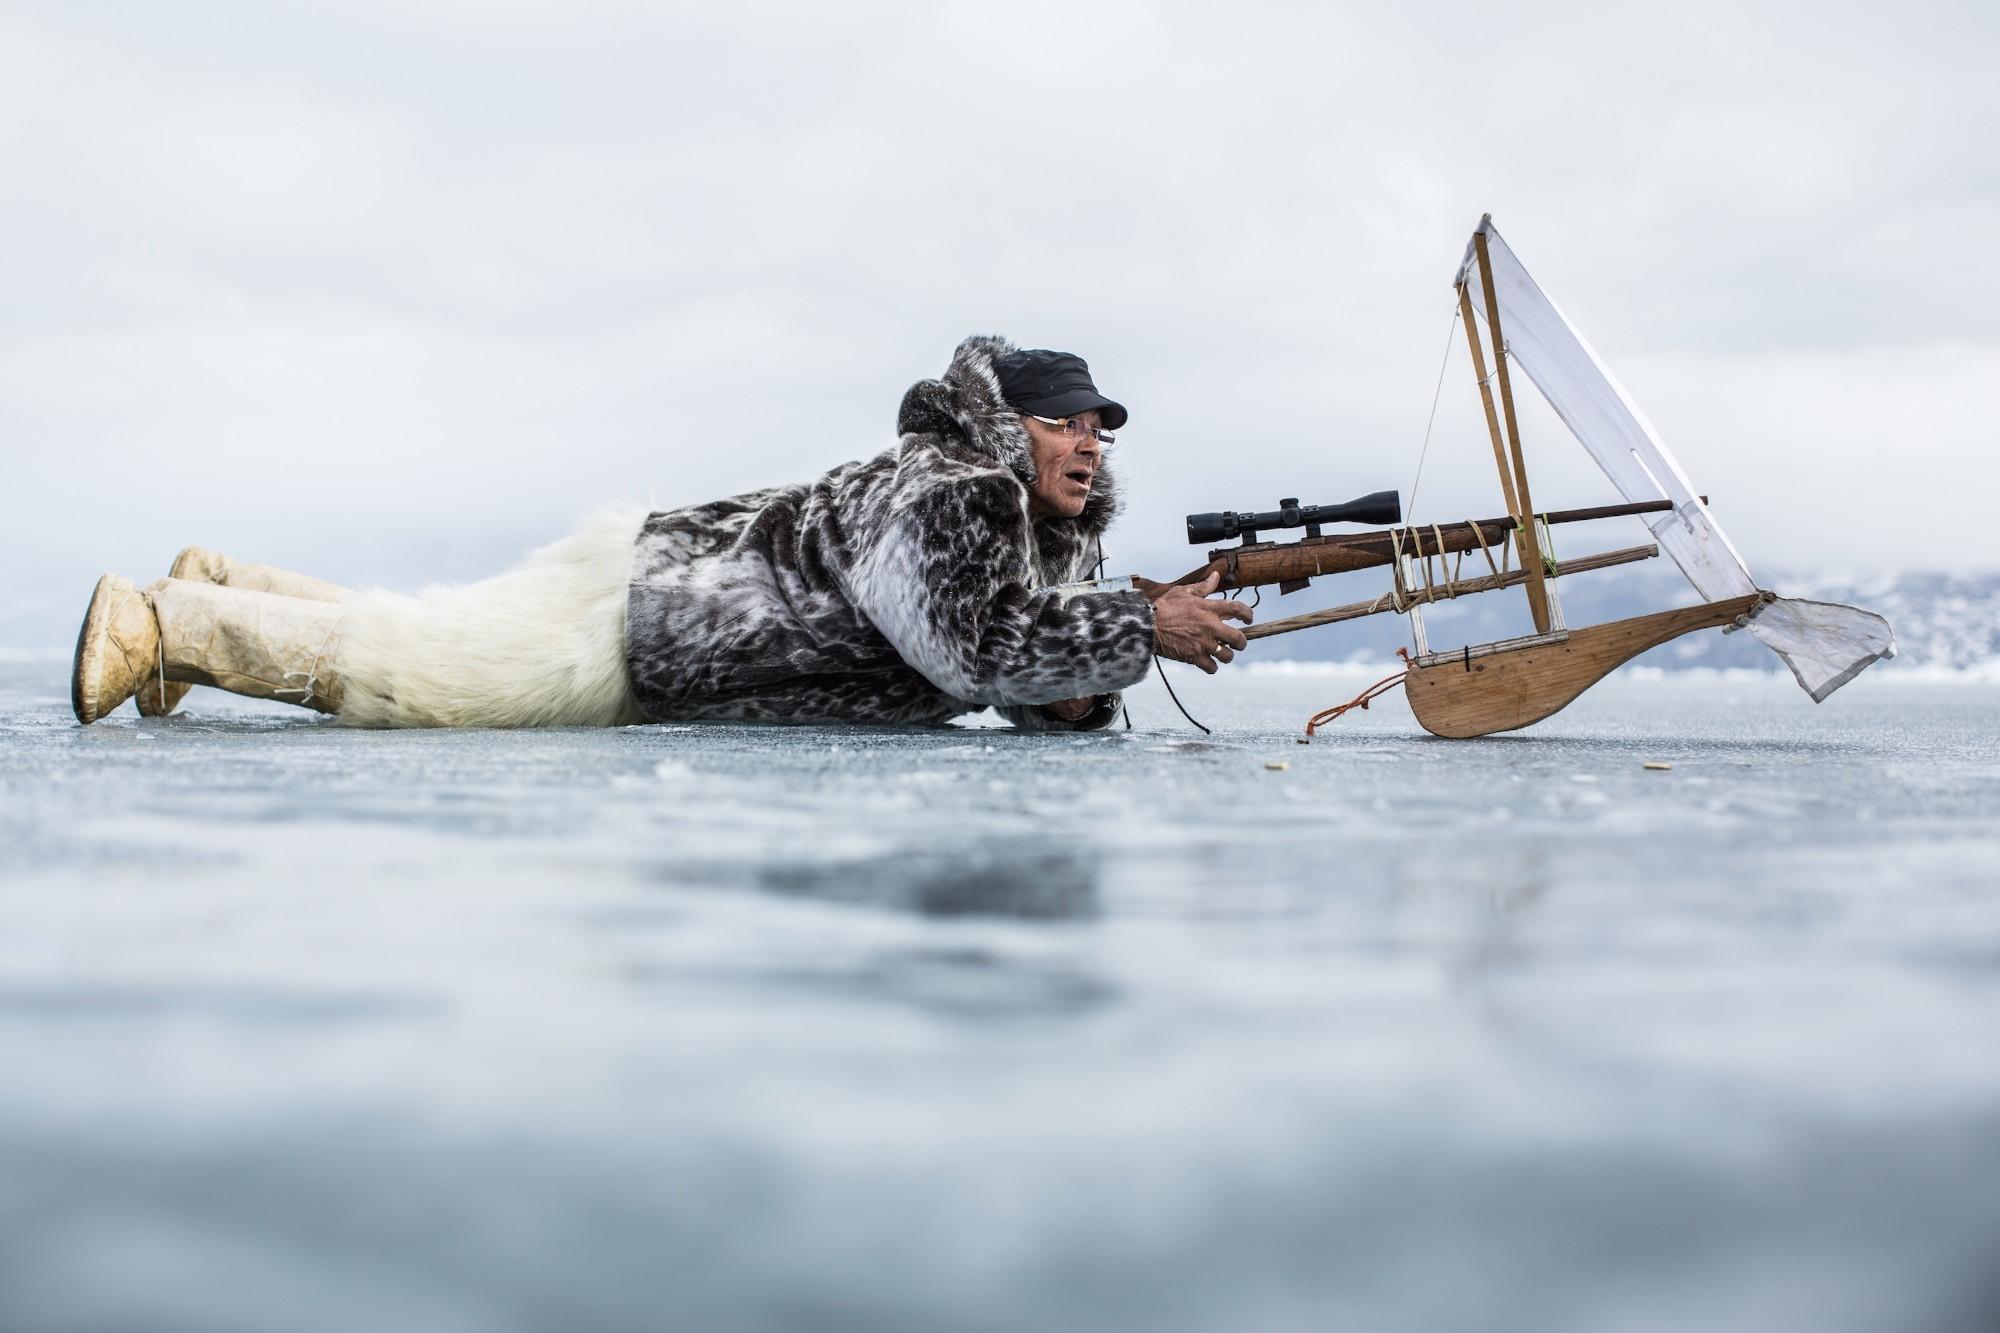 Cirili Jazbec 011-On-thin-ice-NEW